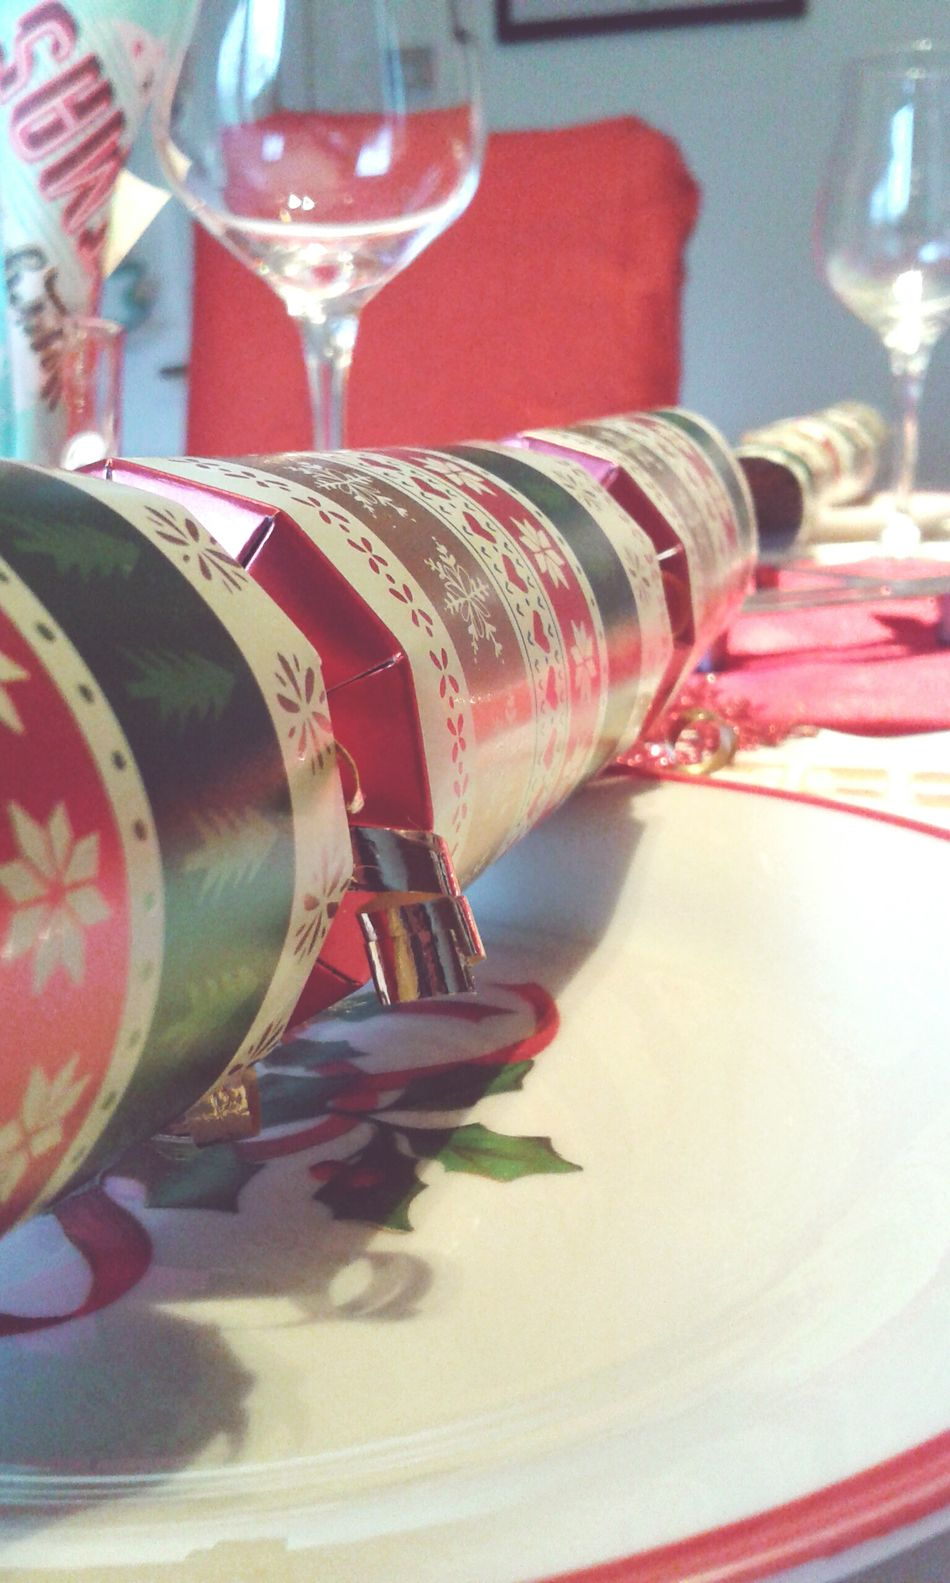 My Winter Favorites Christmastime Christmas Spirit Christmas Is Coming Christmascrackers Dinnertable Glasses Wine Wintertime Winter Wonderland Showcase: December